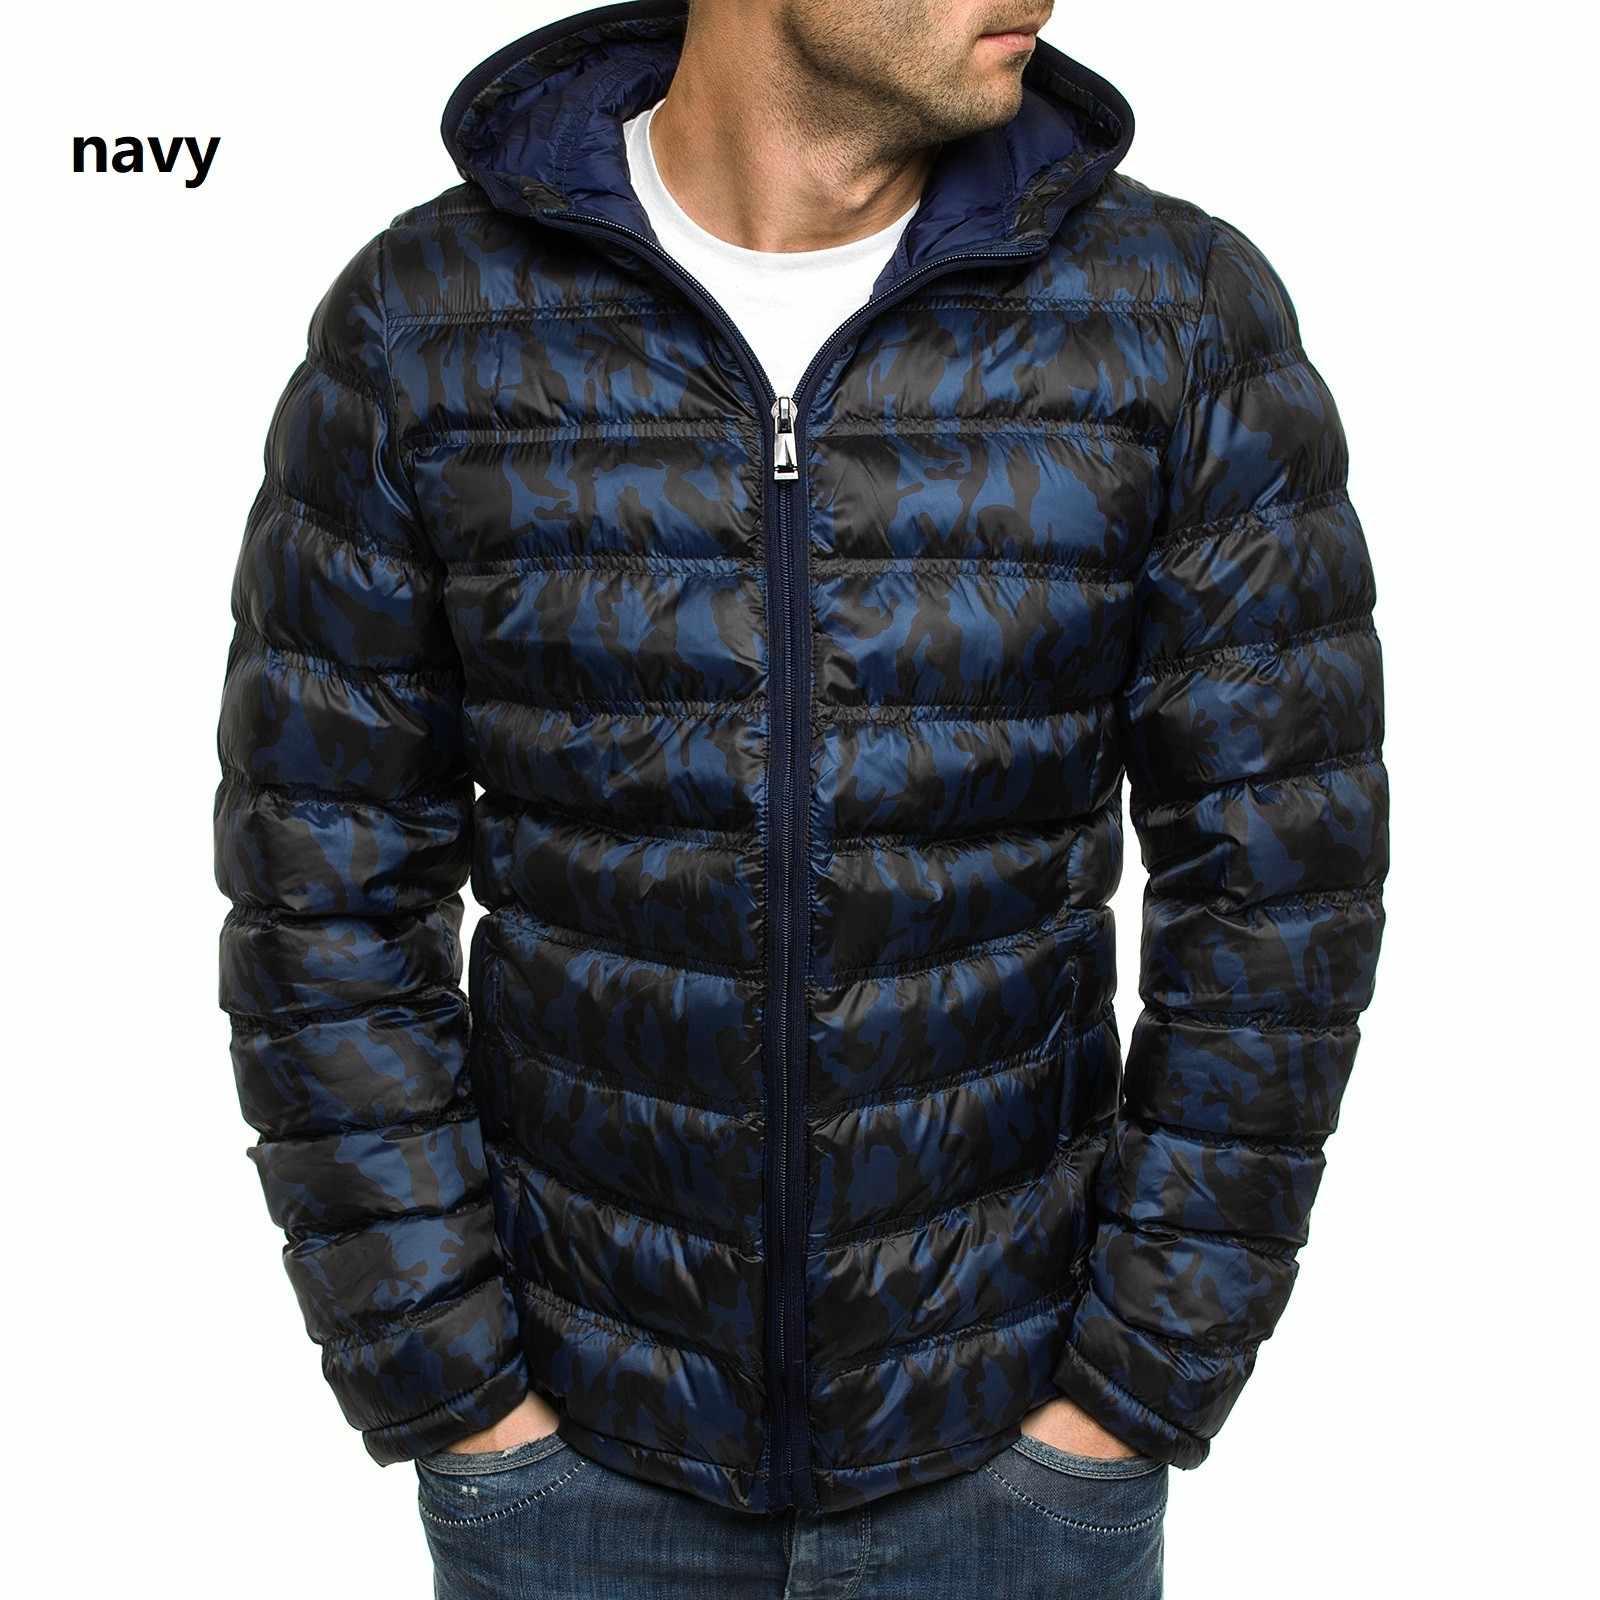 Laamei 冬のジャケットの男性迷彩ジャケット暖かいフード付きオーバーコートカジュアルブランドダウンジャケットパーカー男性パーカープラスサイズ